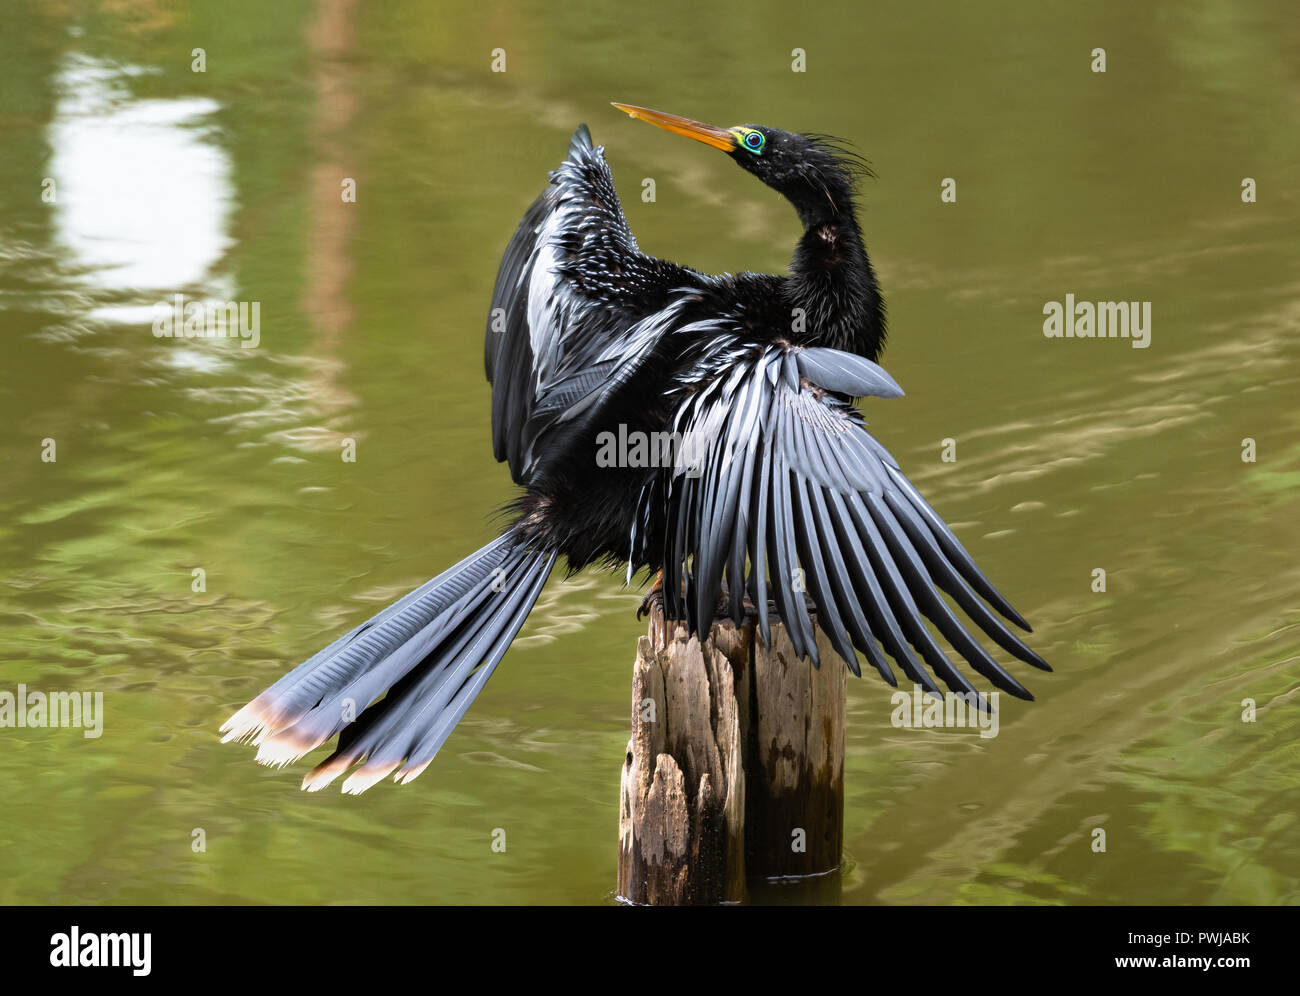 Anhinga dries off after hunting. - Stock Image